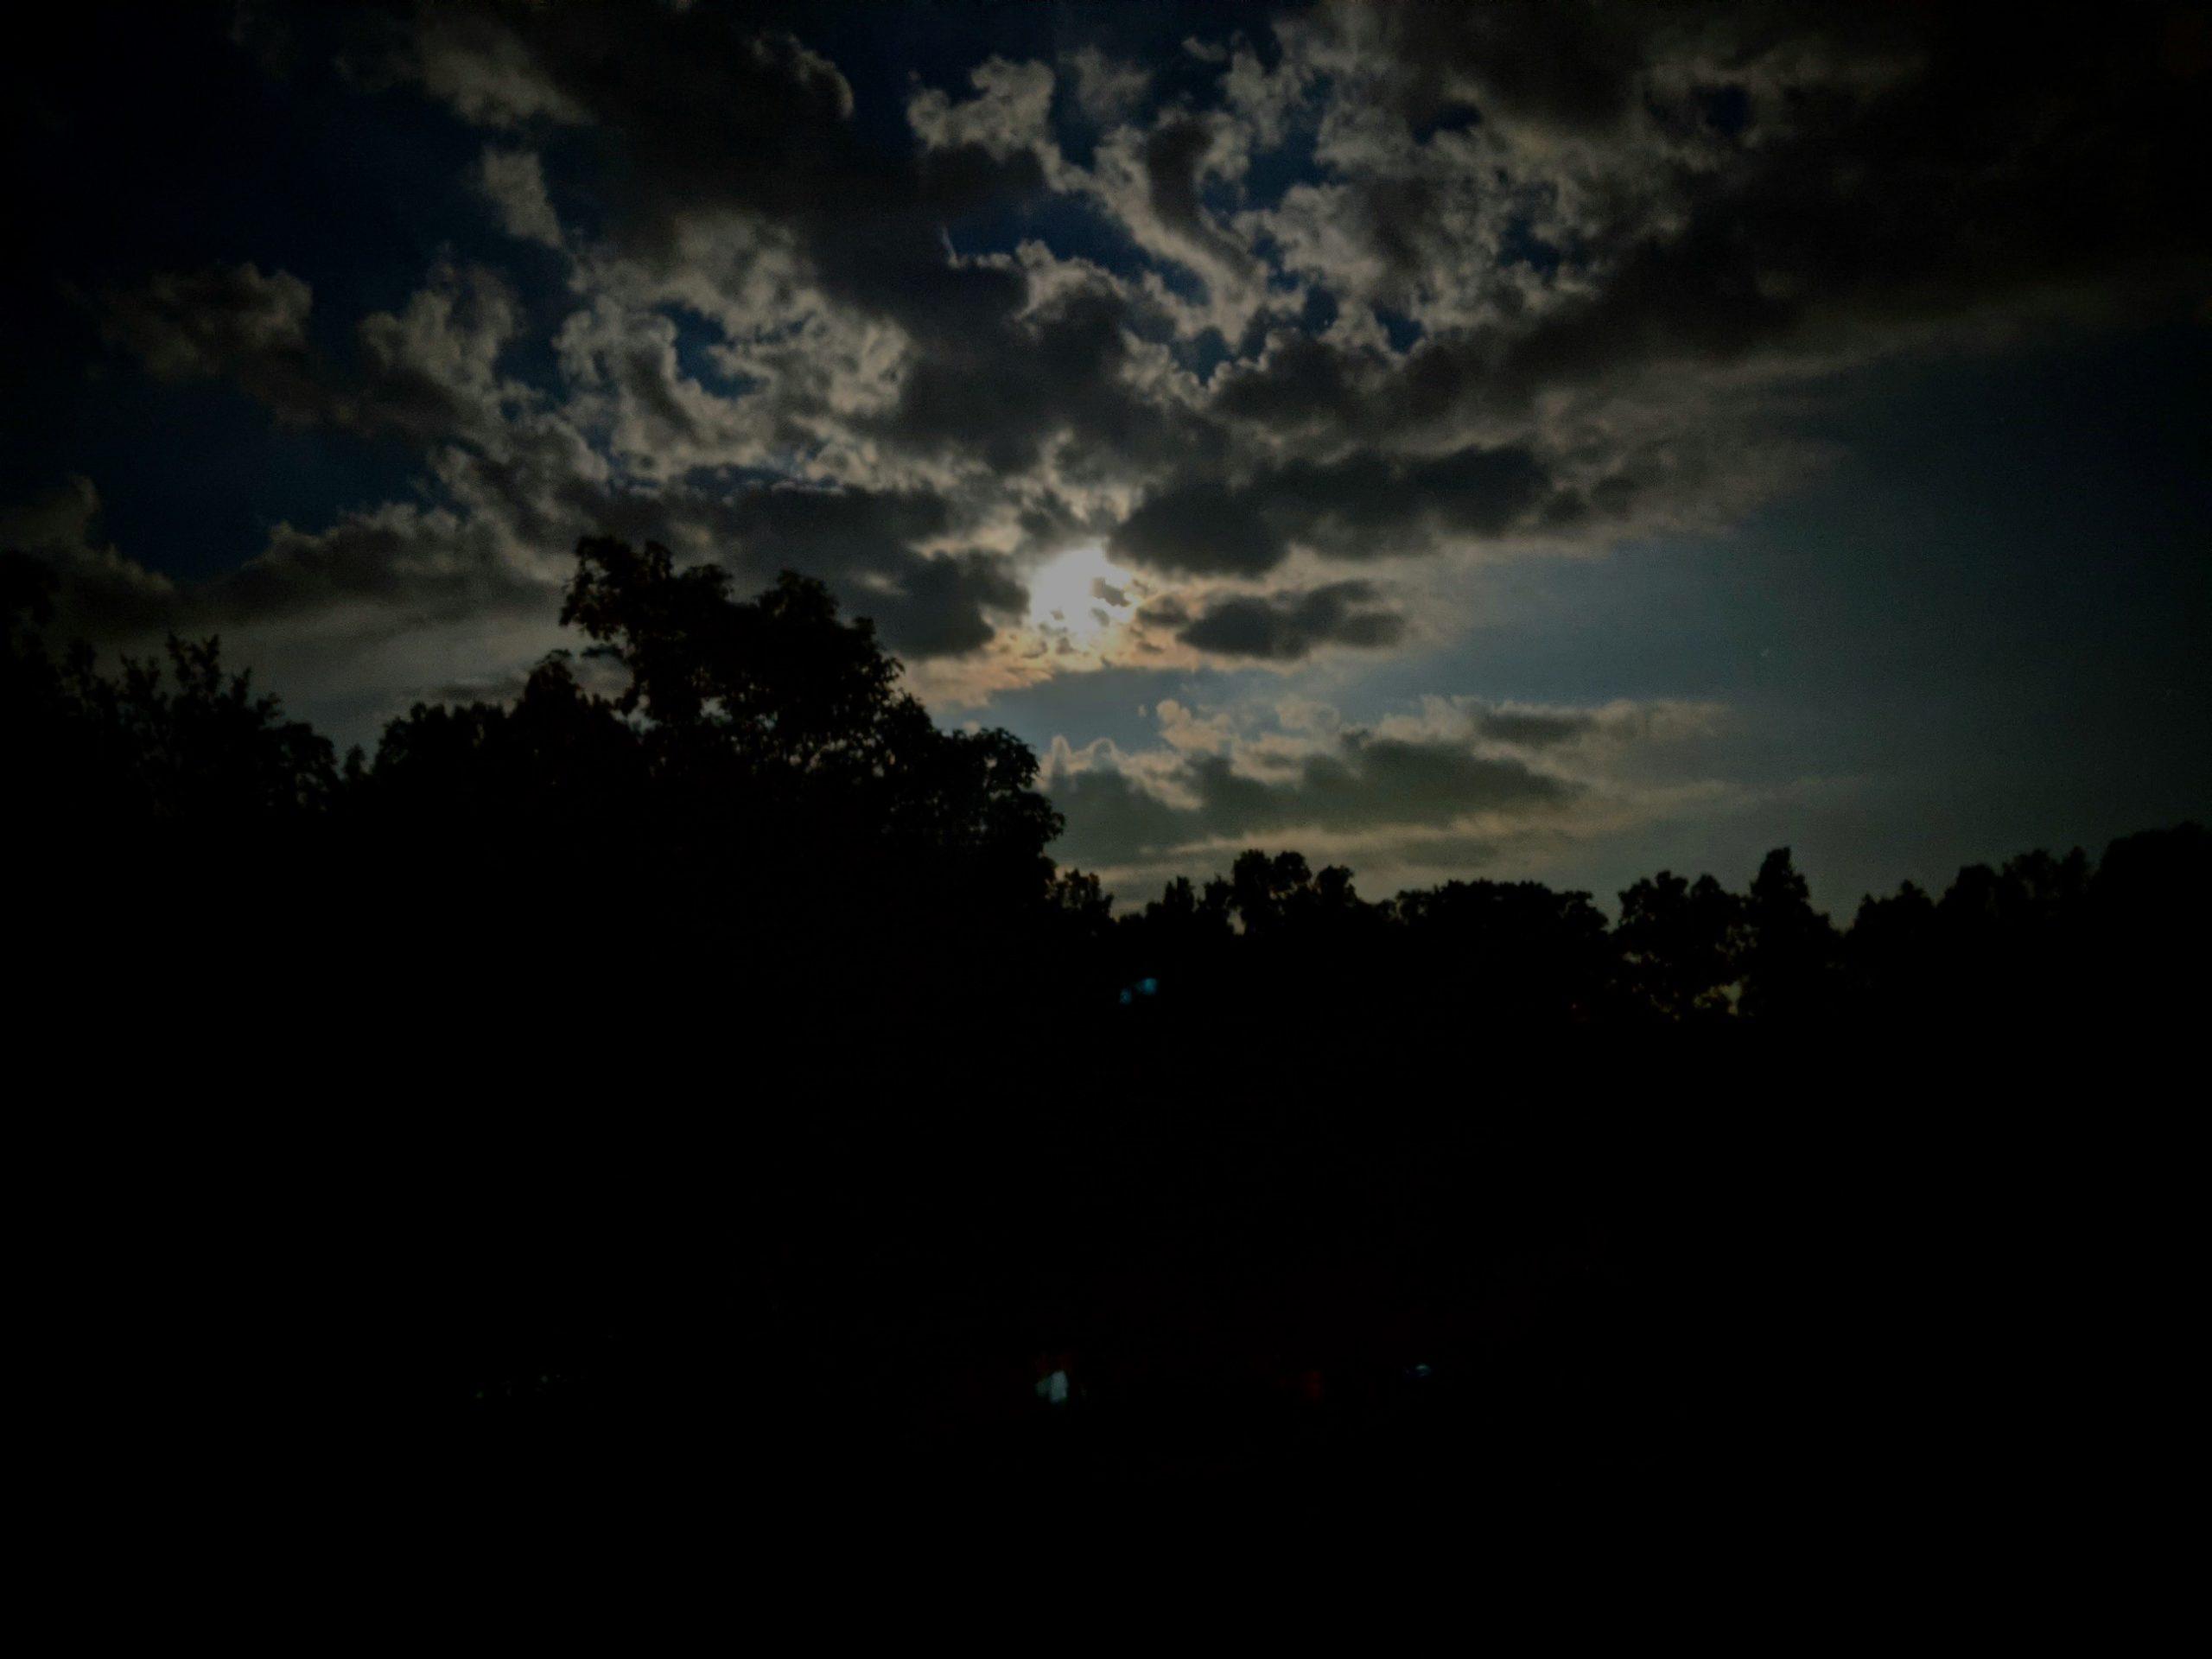 Poetry Break On An August Night